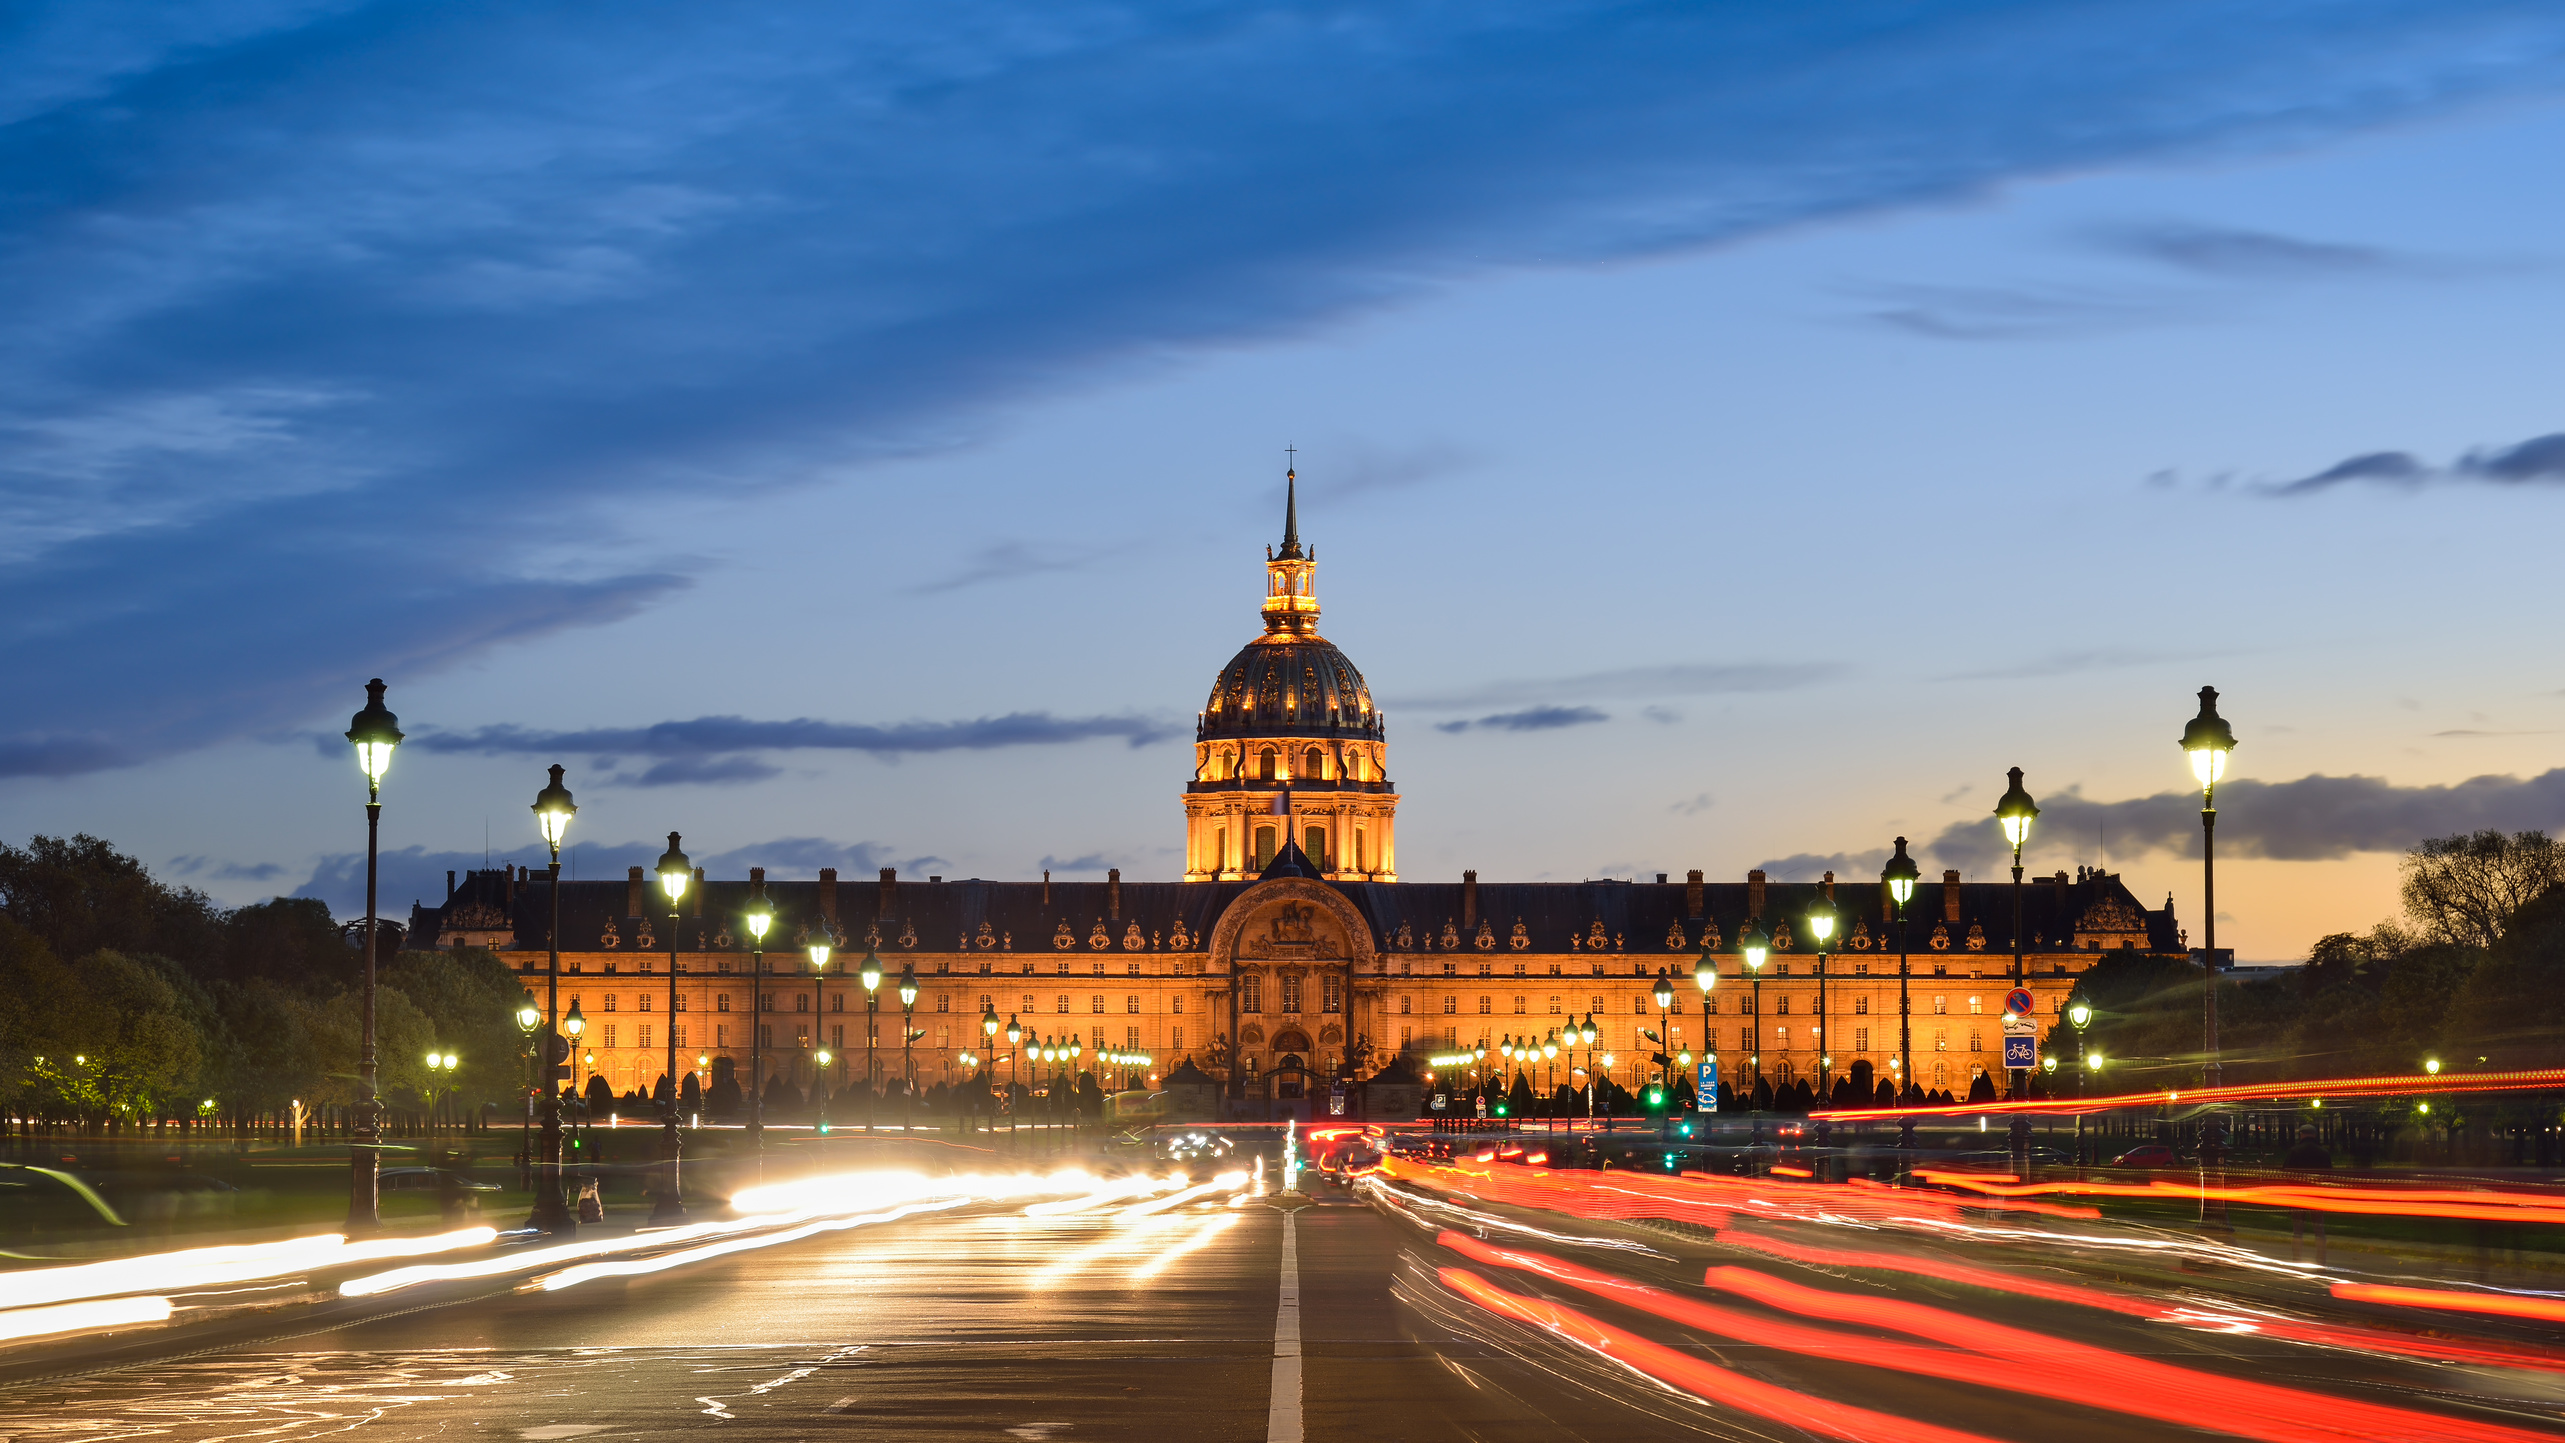 Agence immobili re paris 7i me arrondissement owwi l 39 agence for Agence immobiliere 6eme arrondissement paris